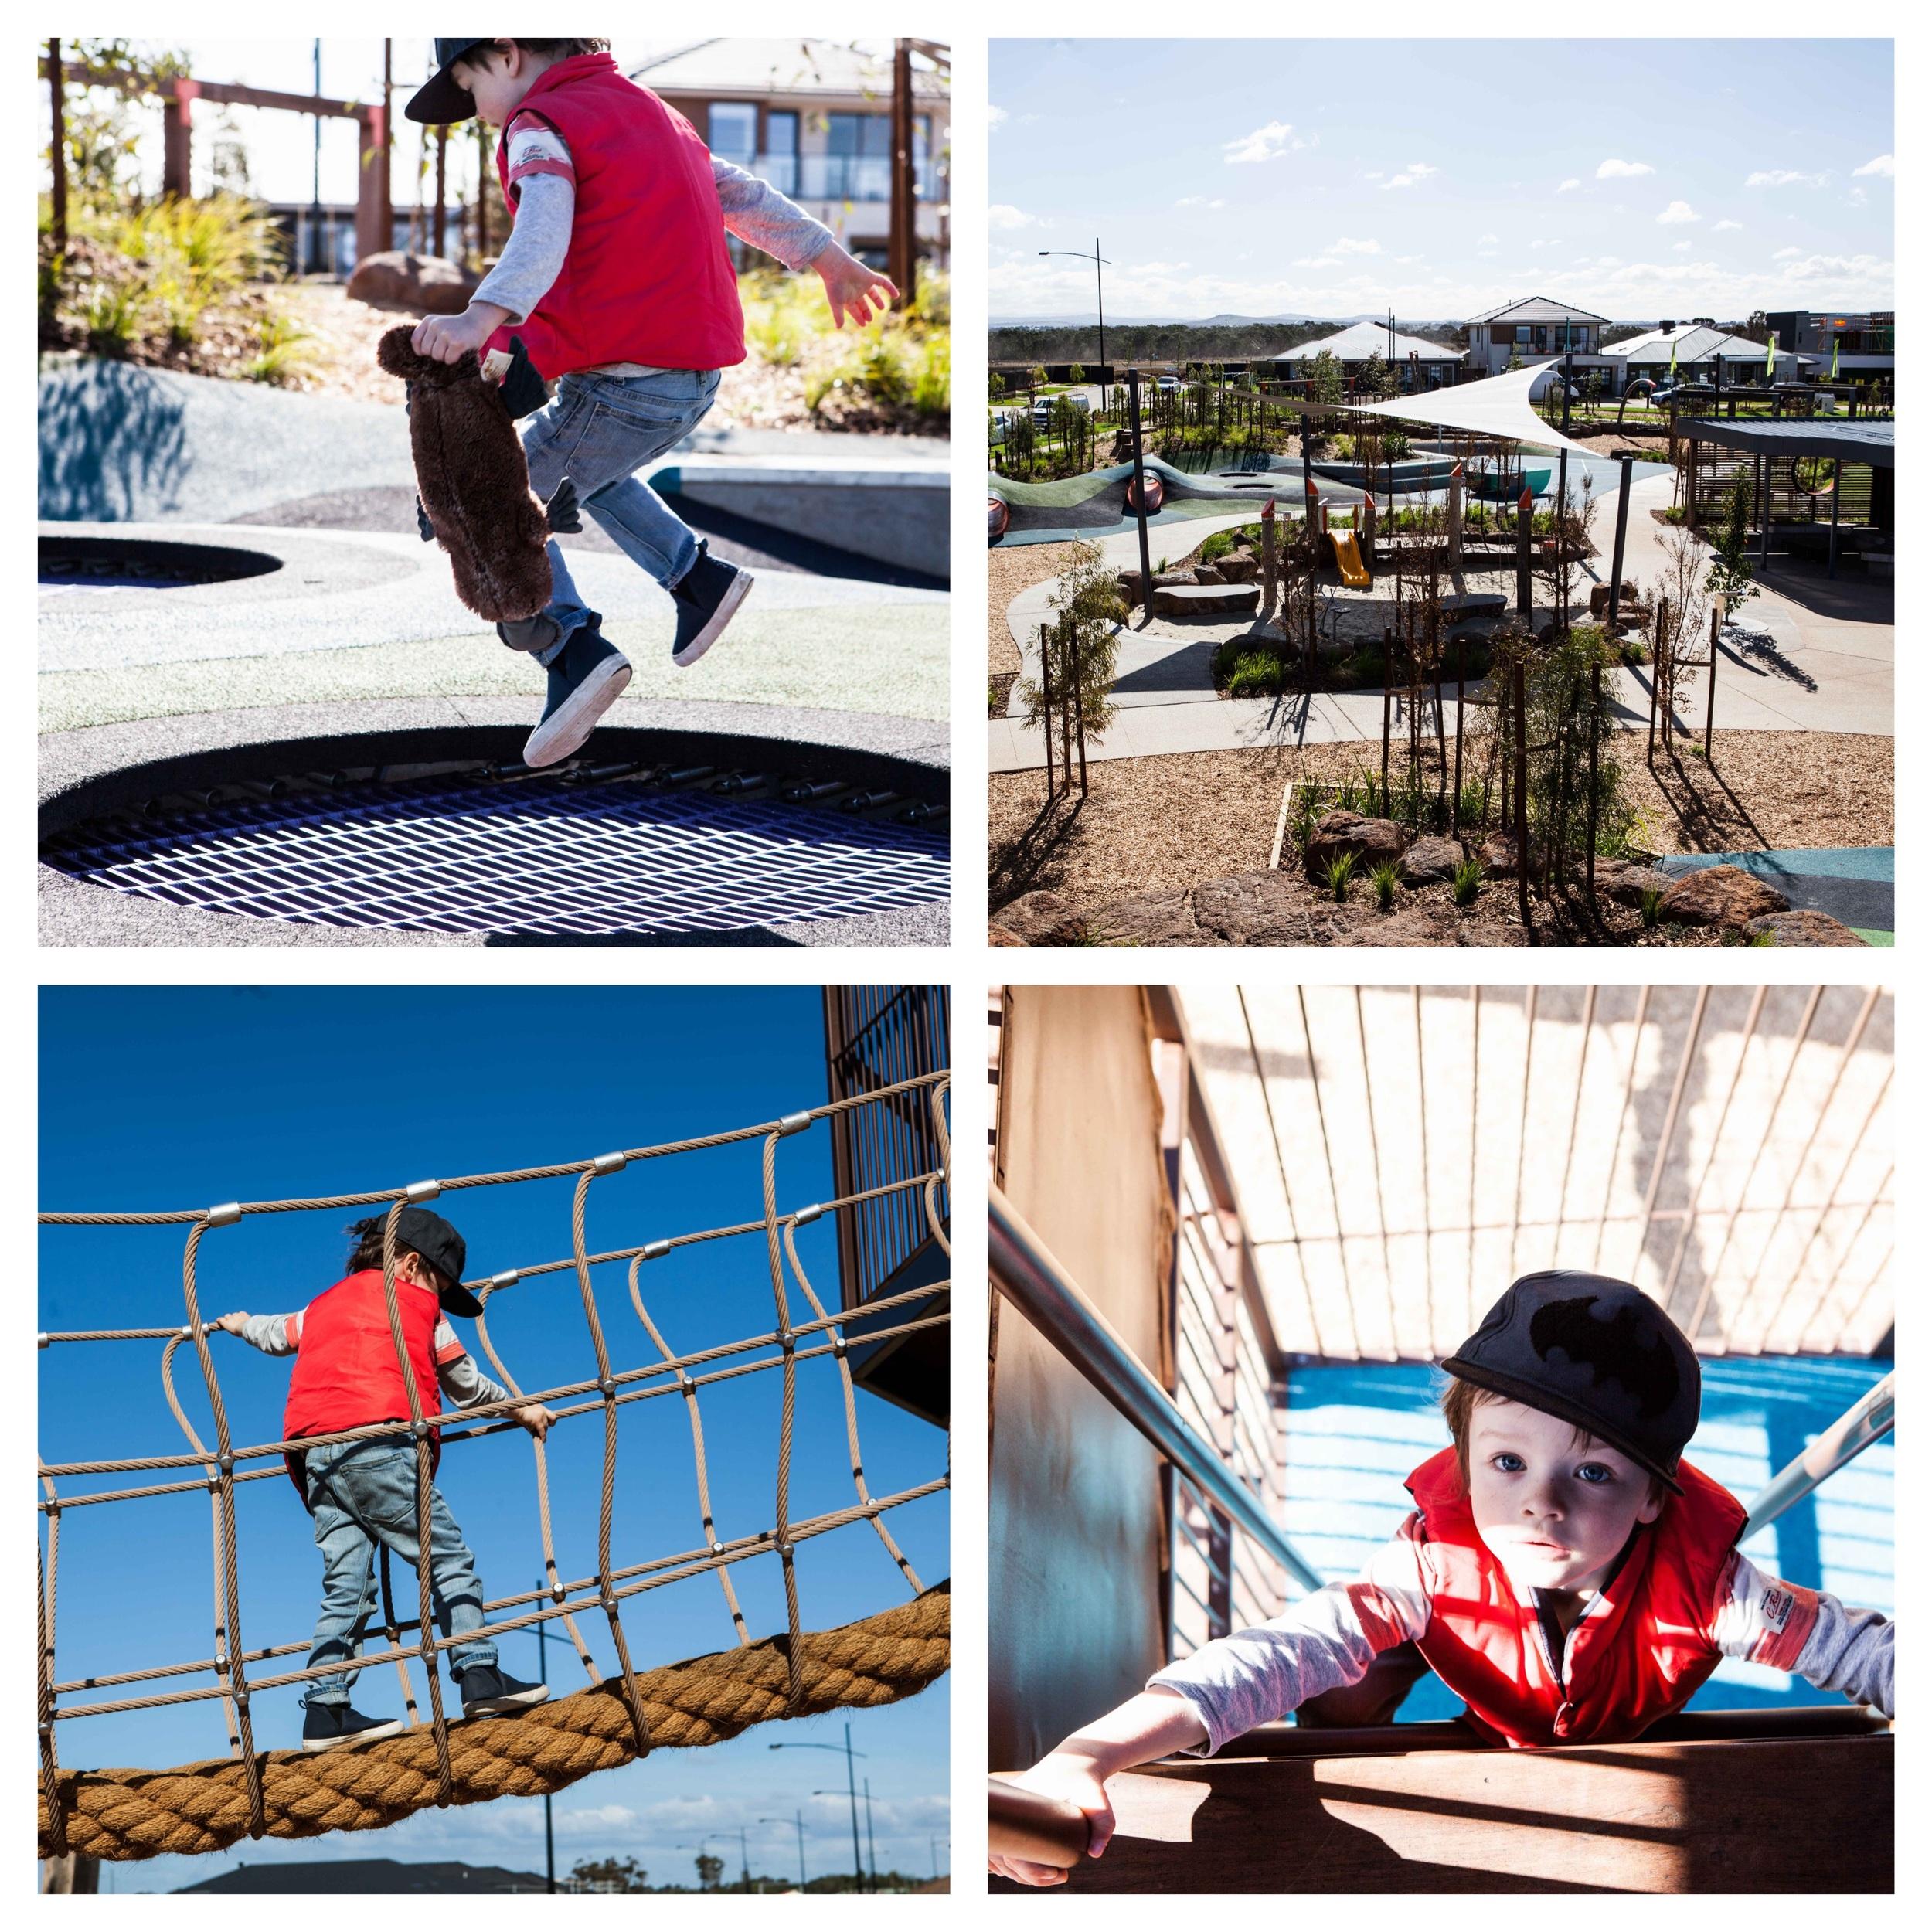 woodlea estate adventure playground - Mamma Knows West